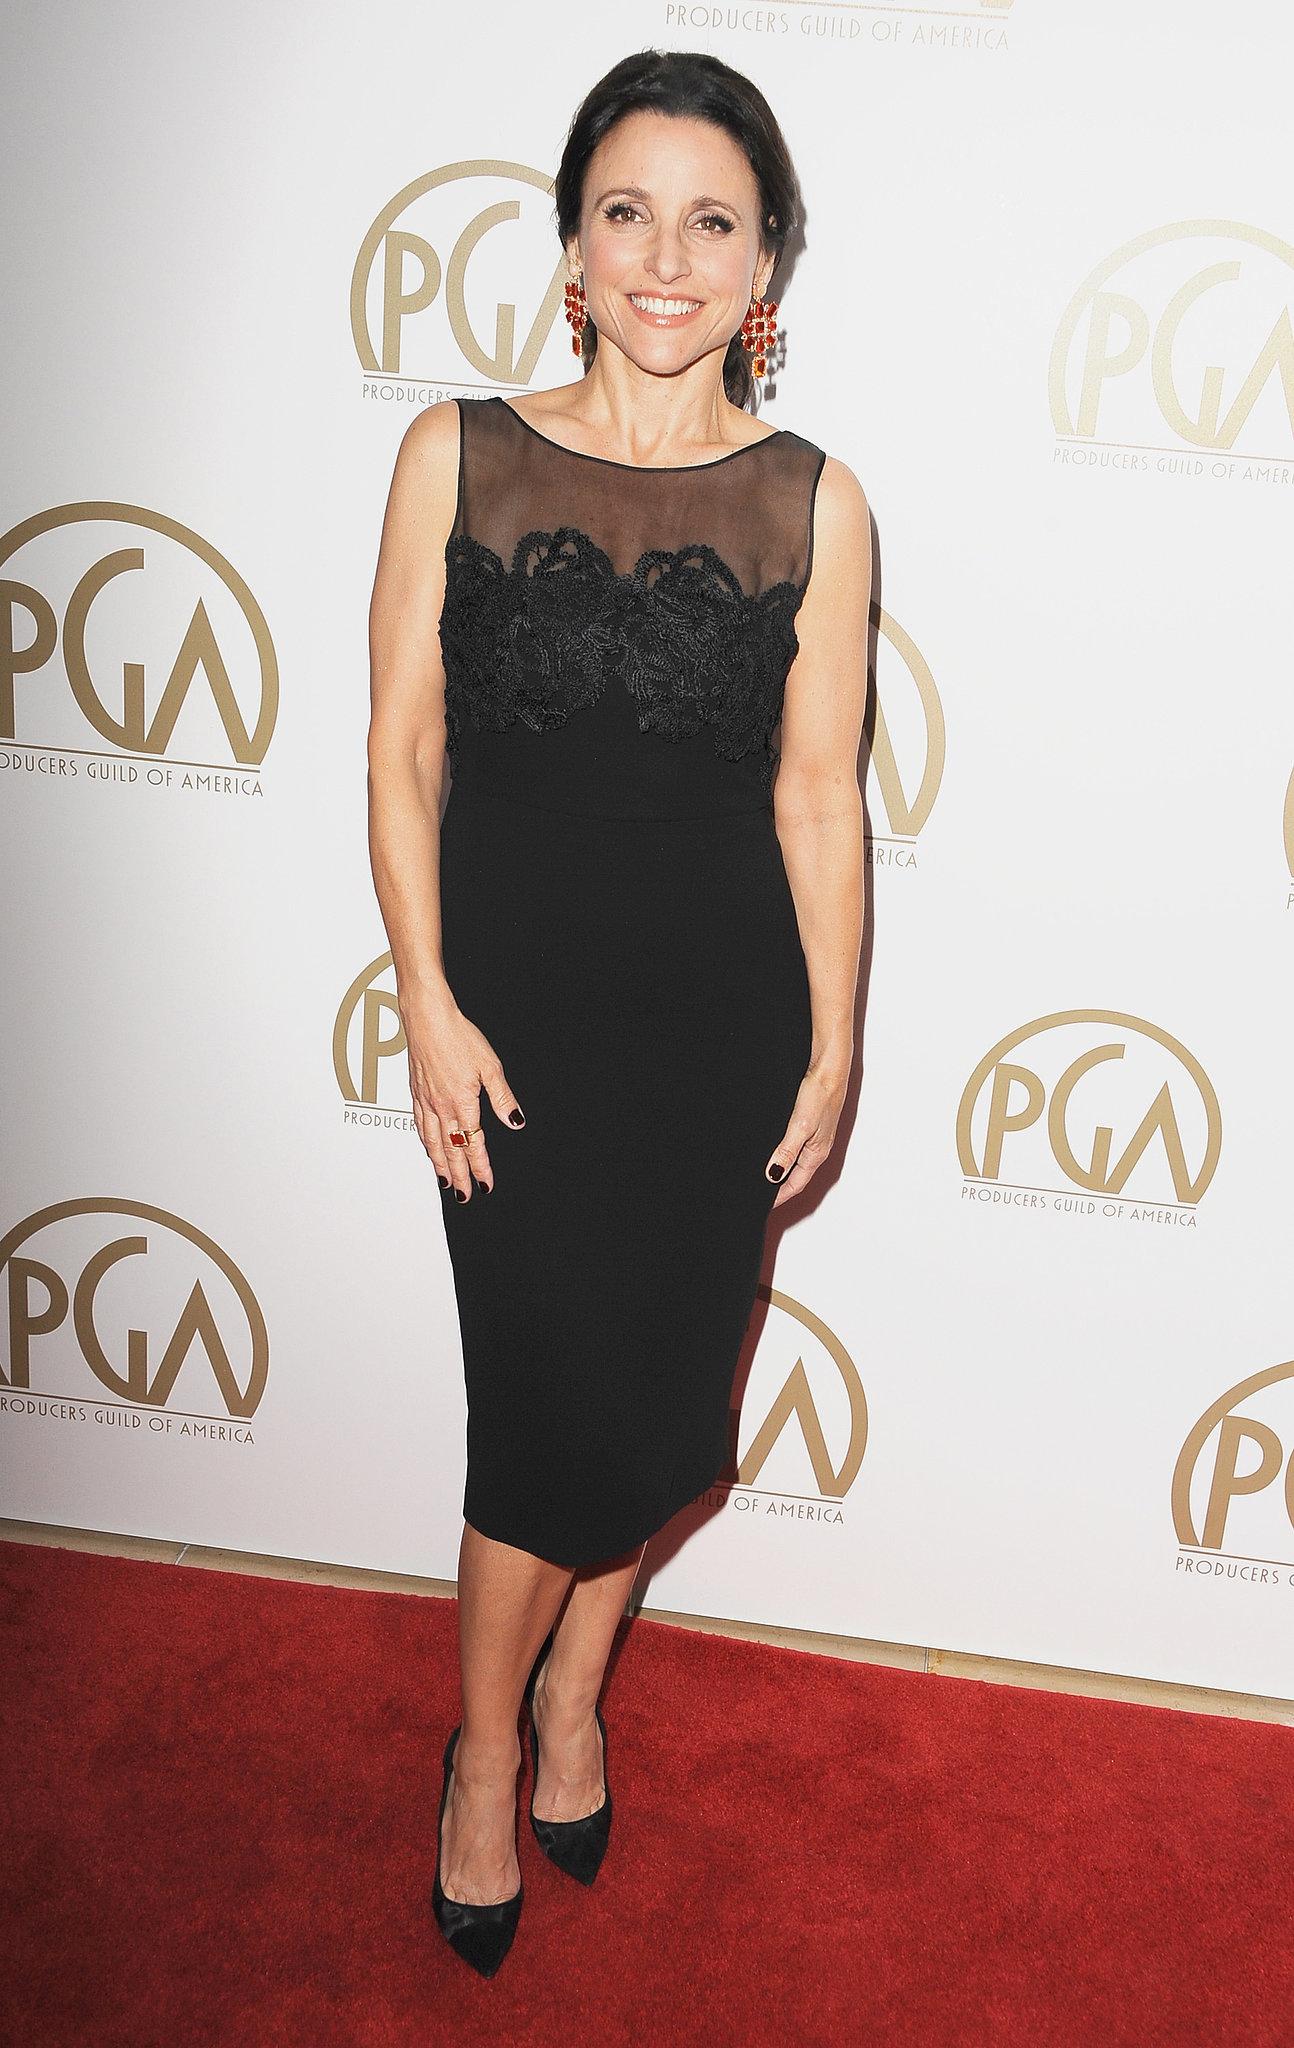 Julia Louis-Dreyfus wore a black dress with a sheer neckline.